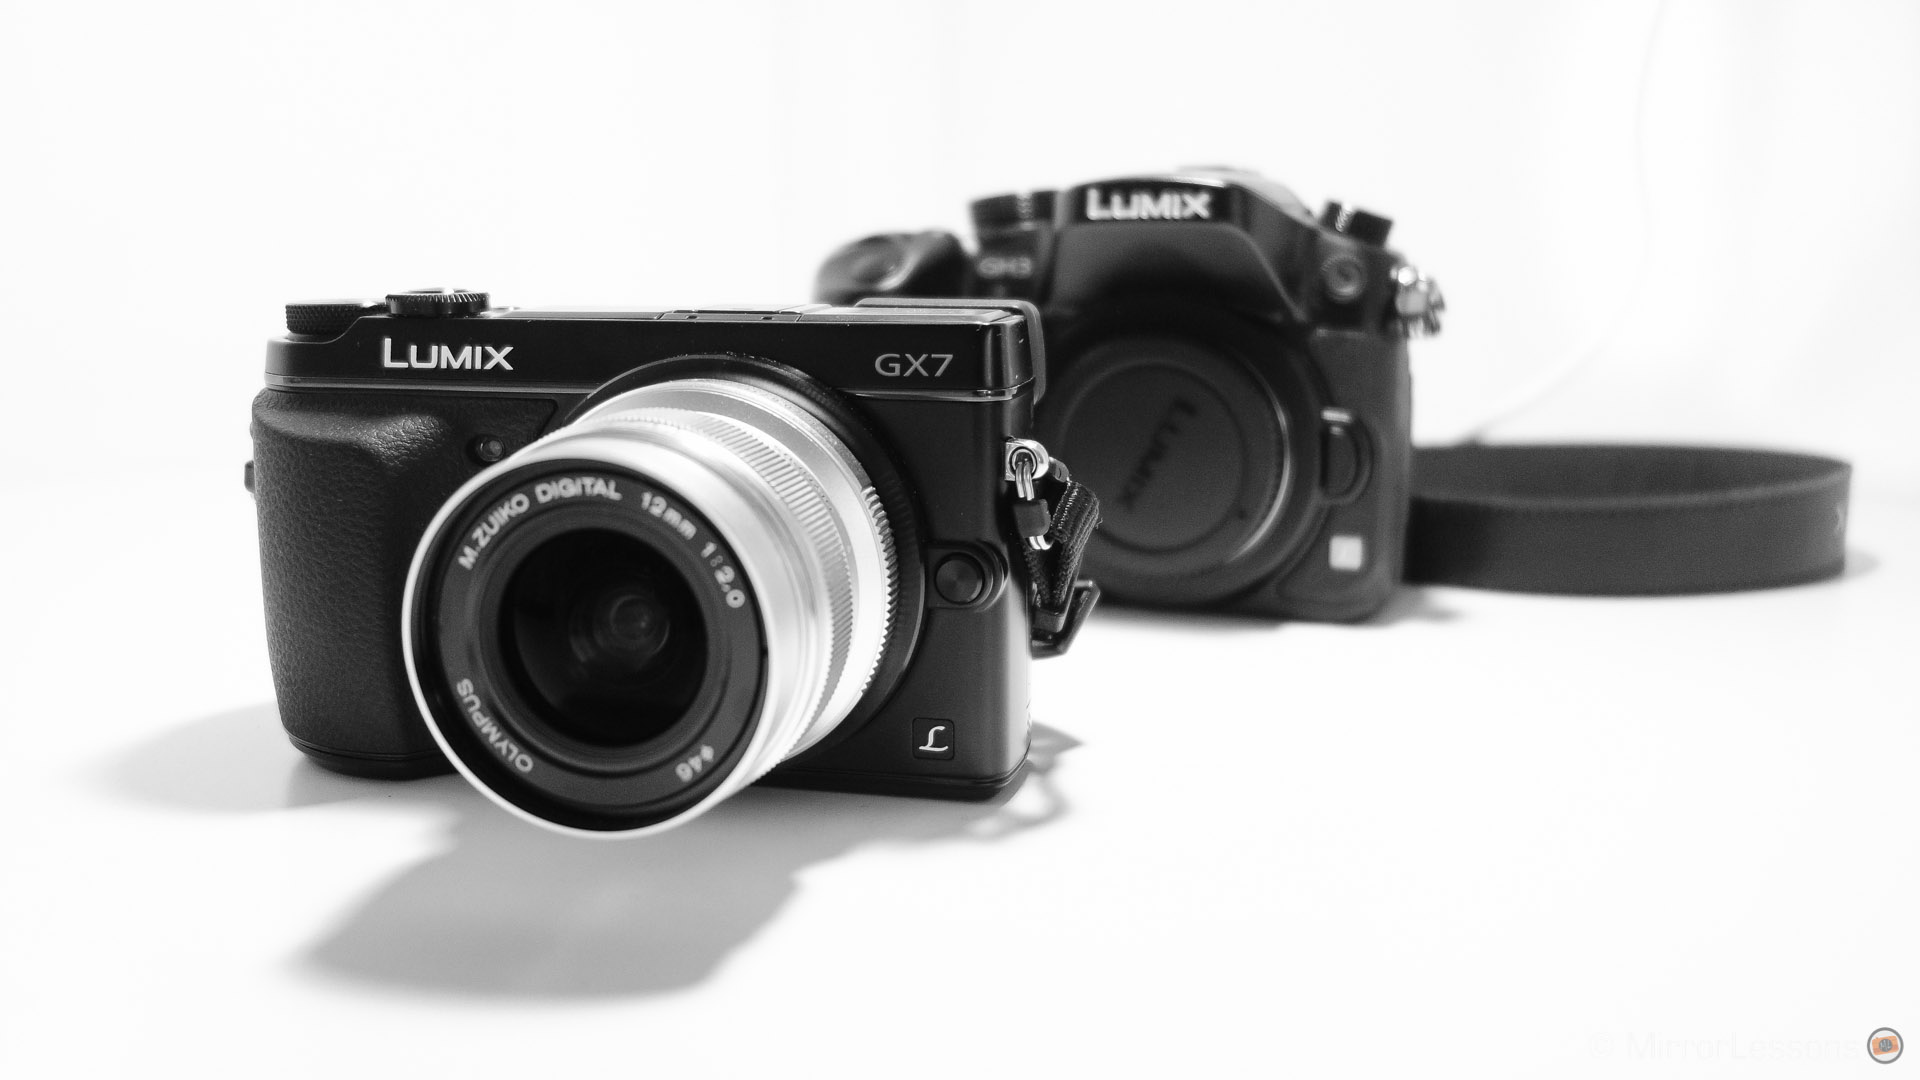 DSC-RX100M2, 1/50, f/ 18/10, ISO 400